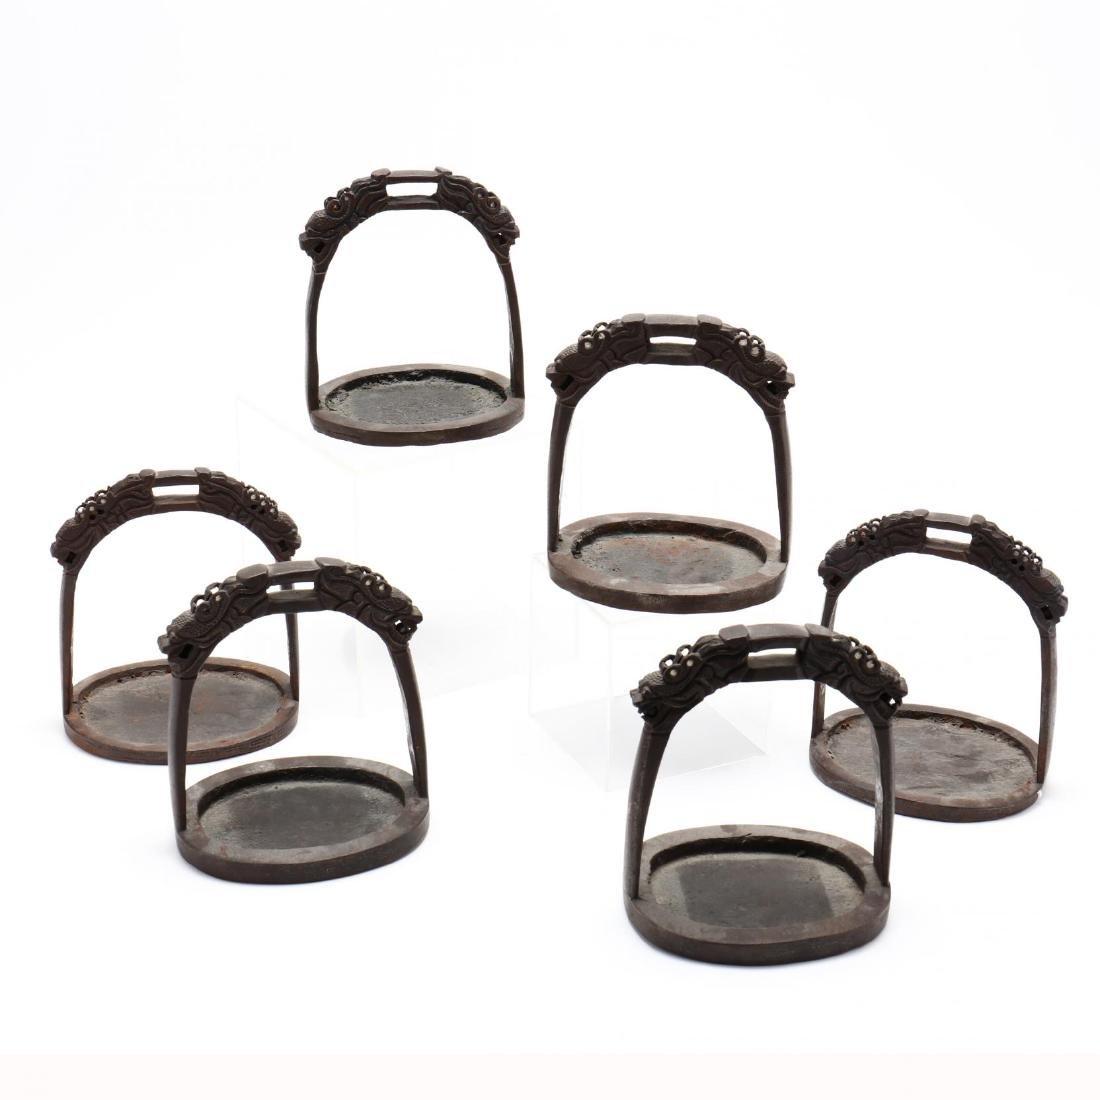 Six Antique Chinese Inlaid Iron Stirrups